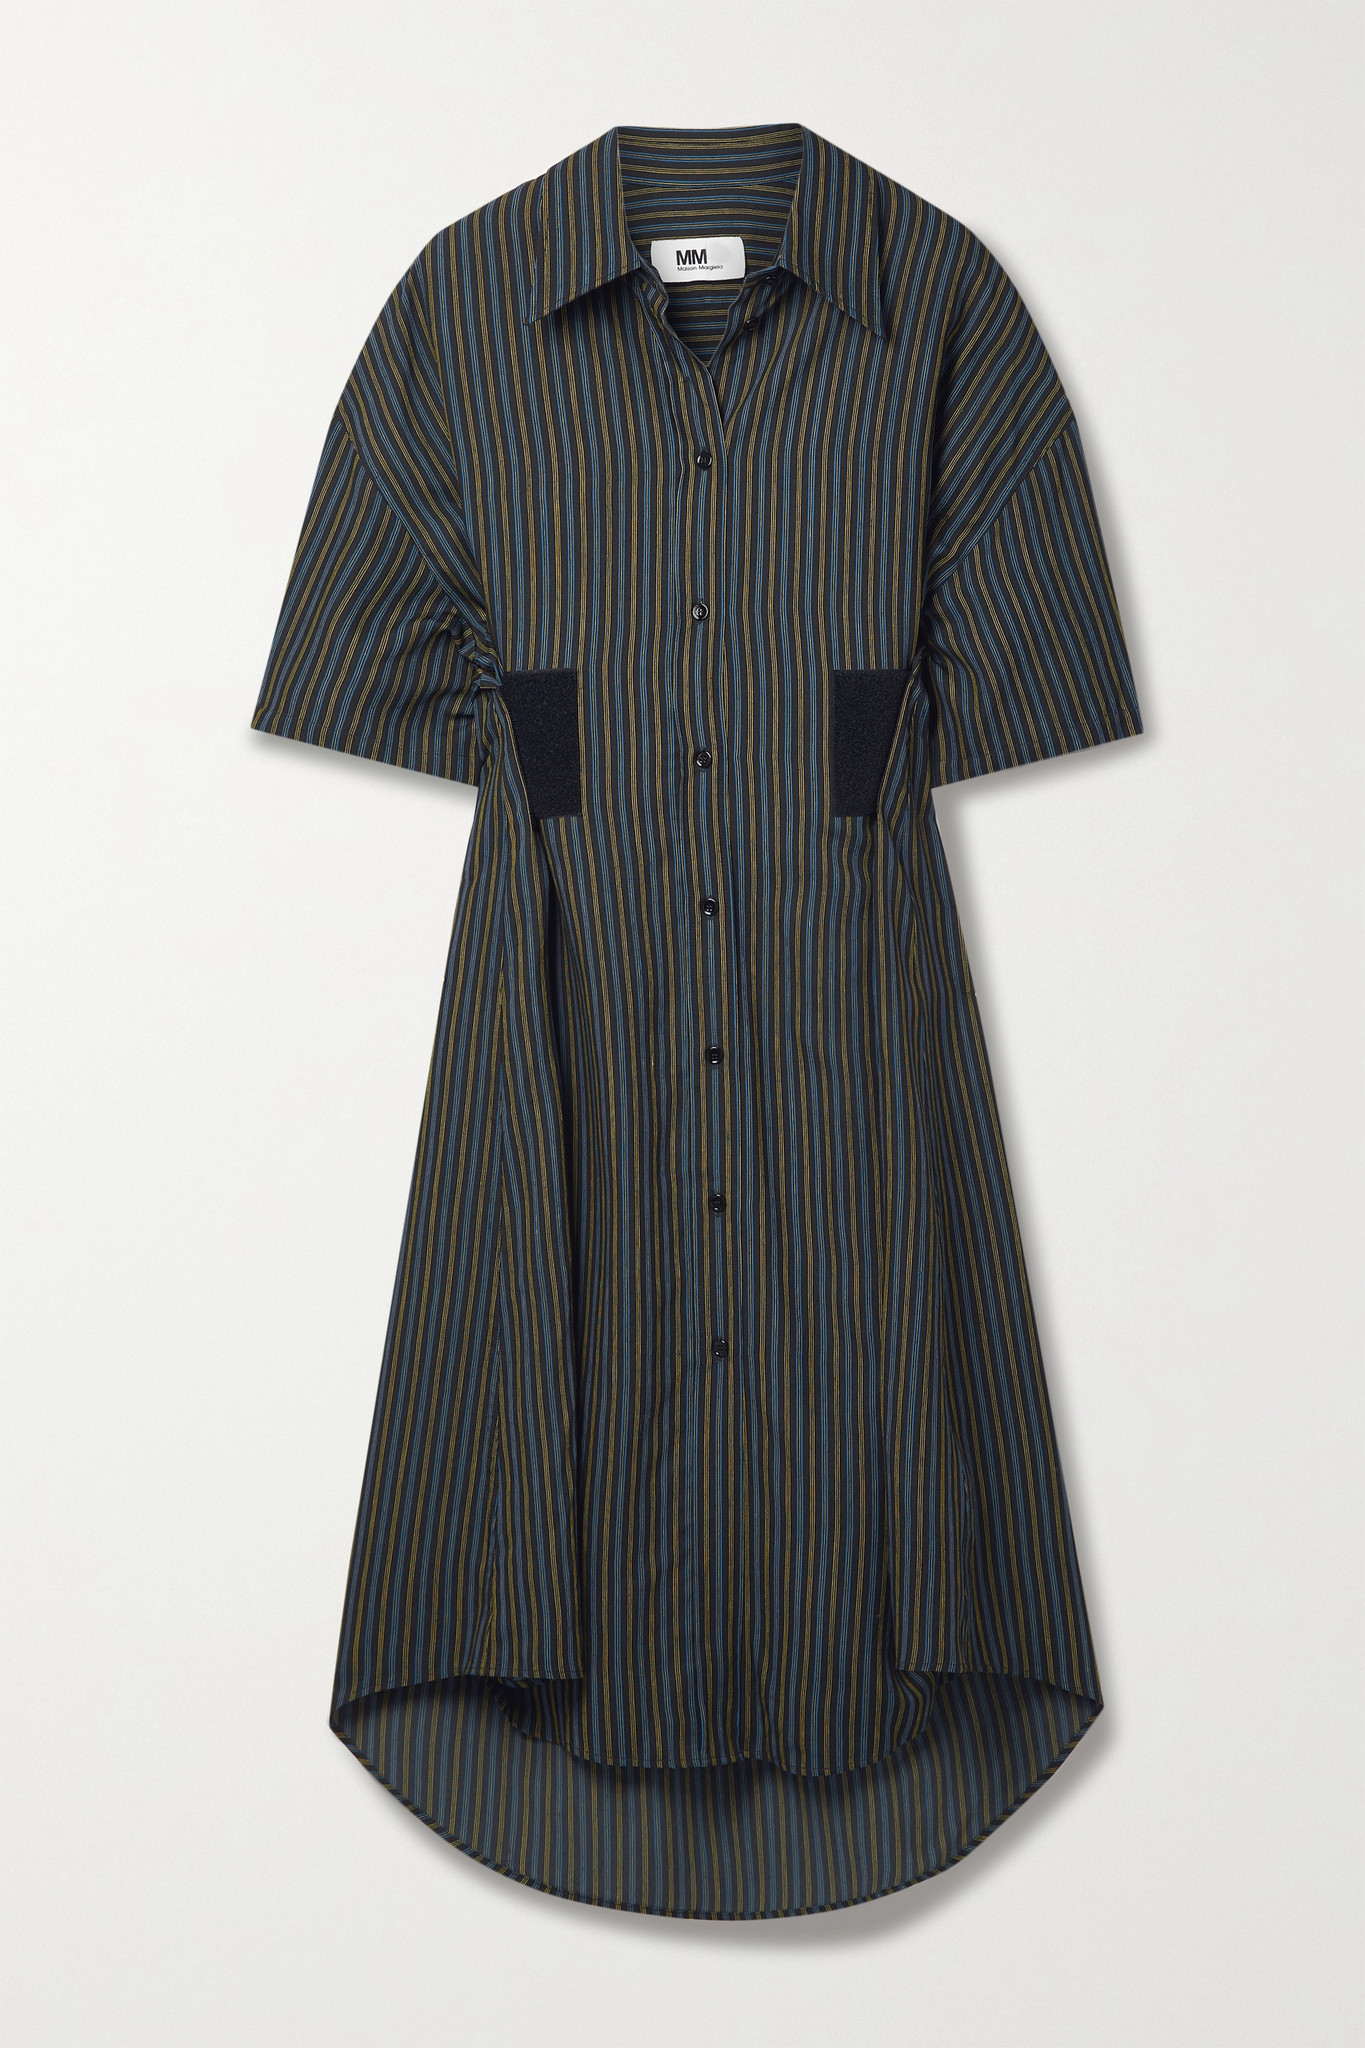 MM6 MAISON MARGIELA - 细条纹斜纹布中长衬衫式连衣裙 - 黑色 - x large